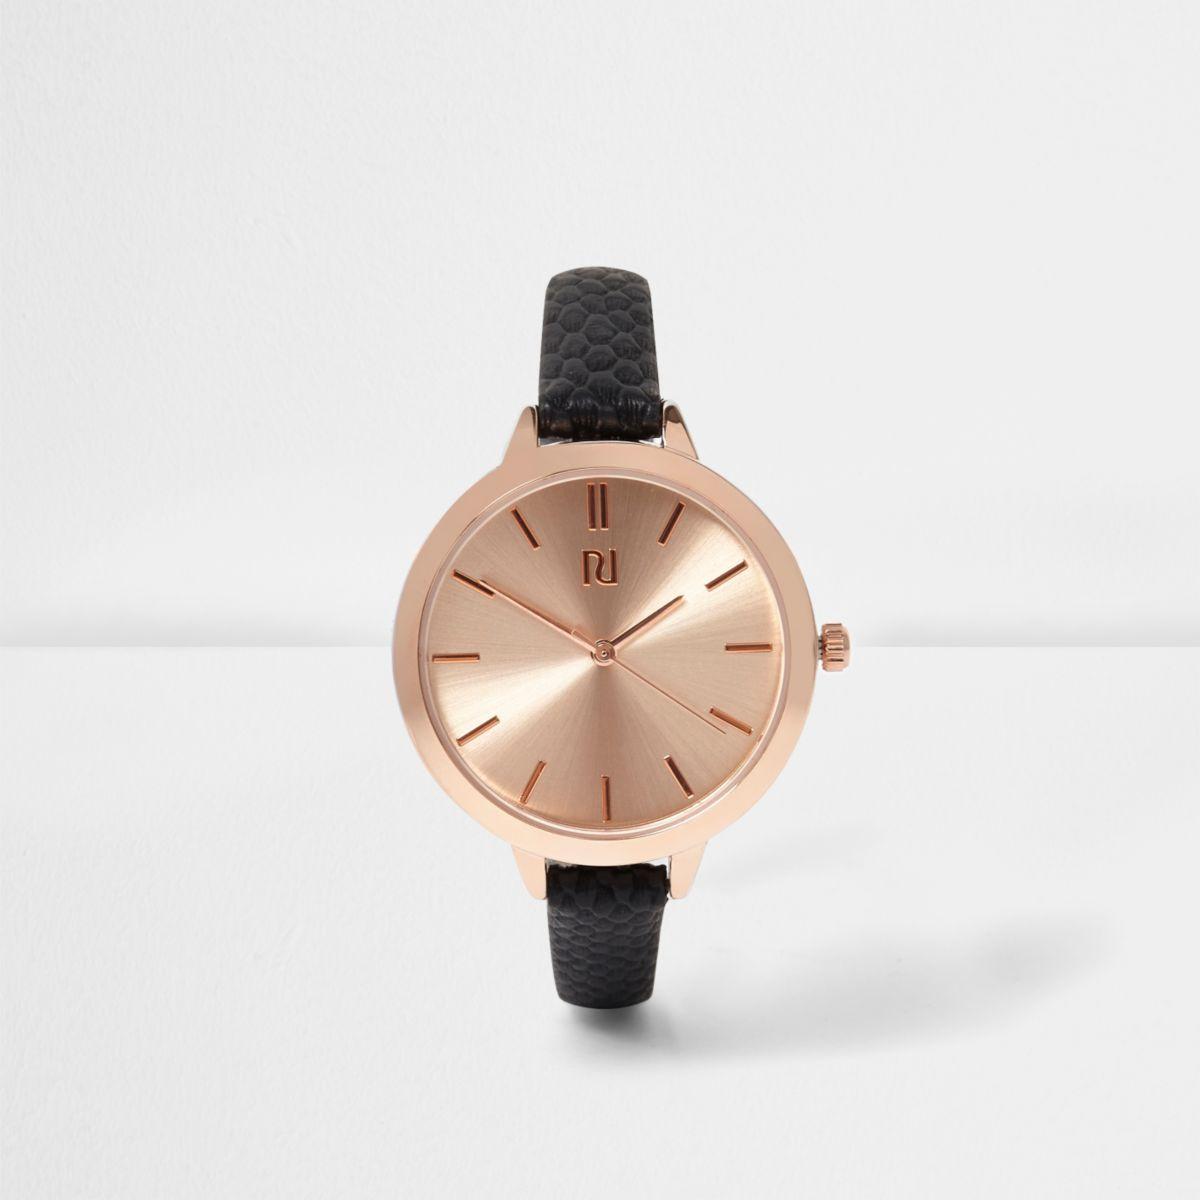 schwarze schmale armbanduhr in ros gold armbanduhren. Black Bedroom Furniture Sets. Home Design Ideas